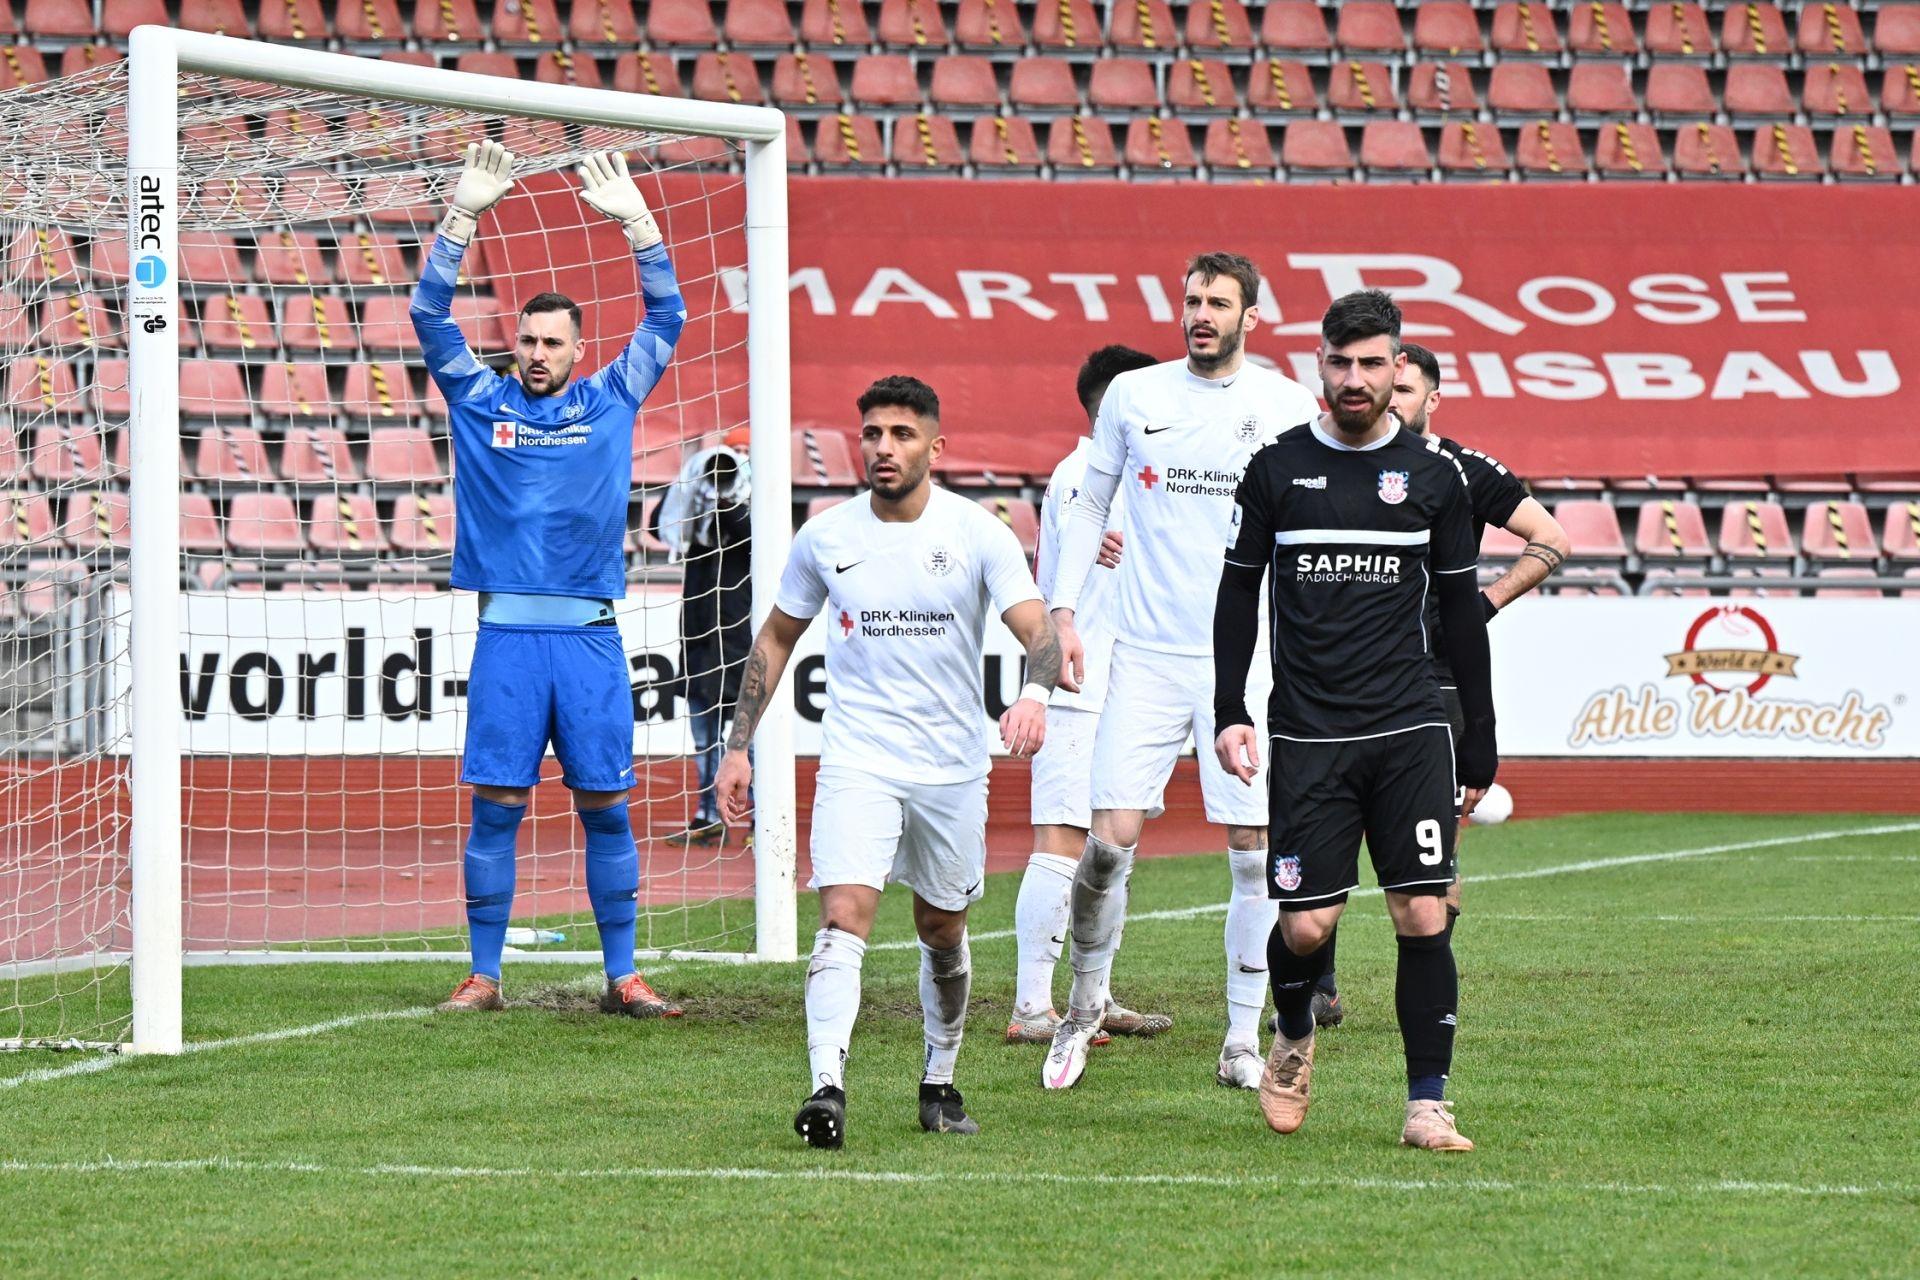 Regionalliga Südwest 2020/21, KSV Hessen Kassel, FSV Frankfurt, Endstand 2:1, Eckball